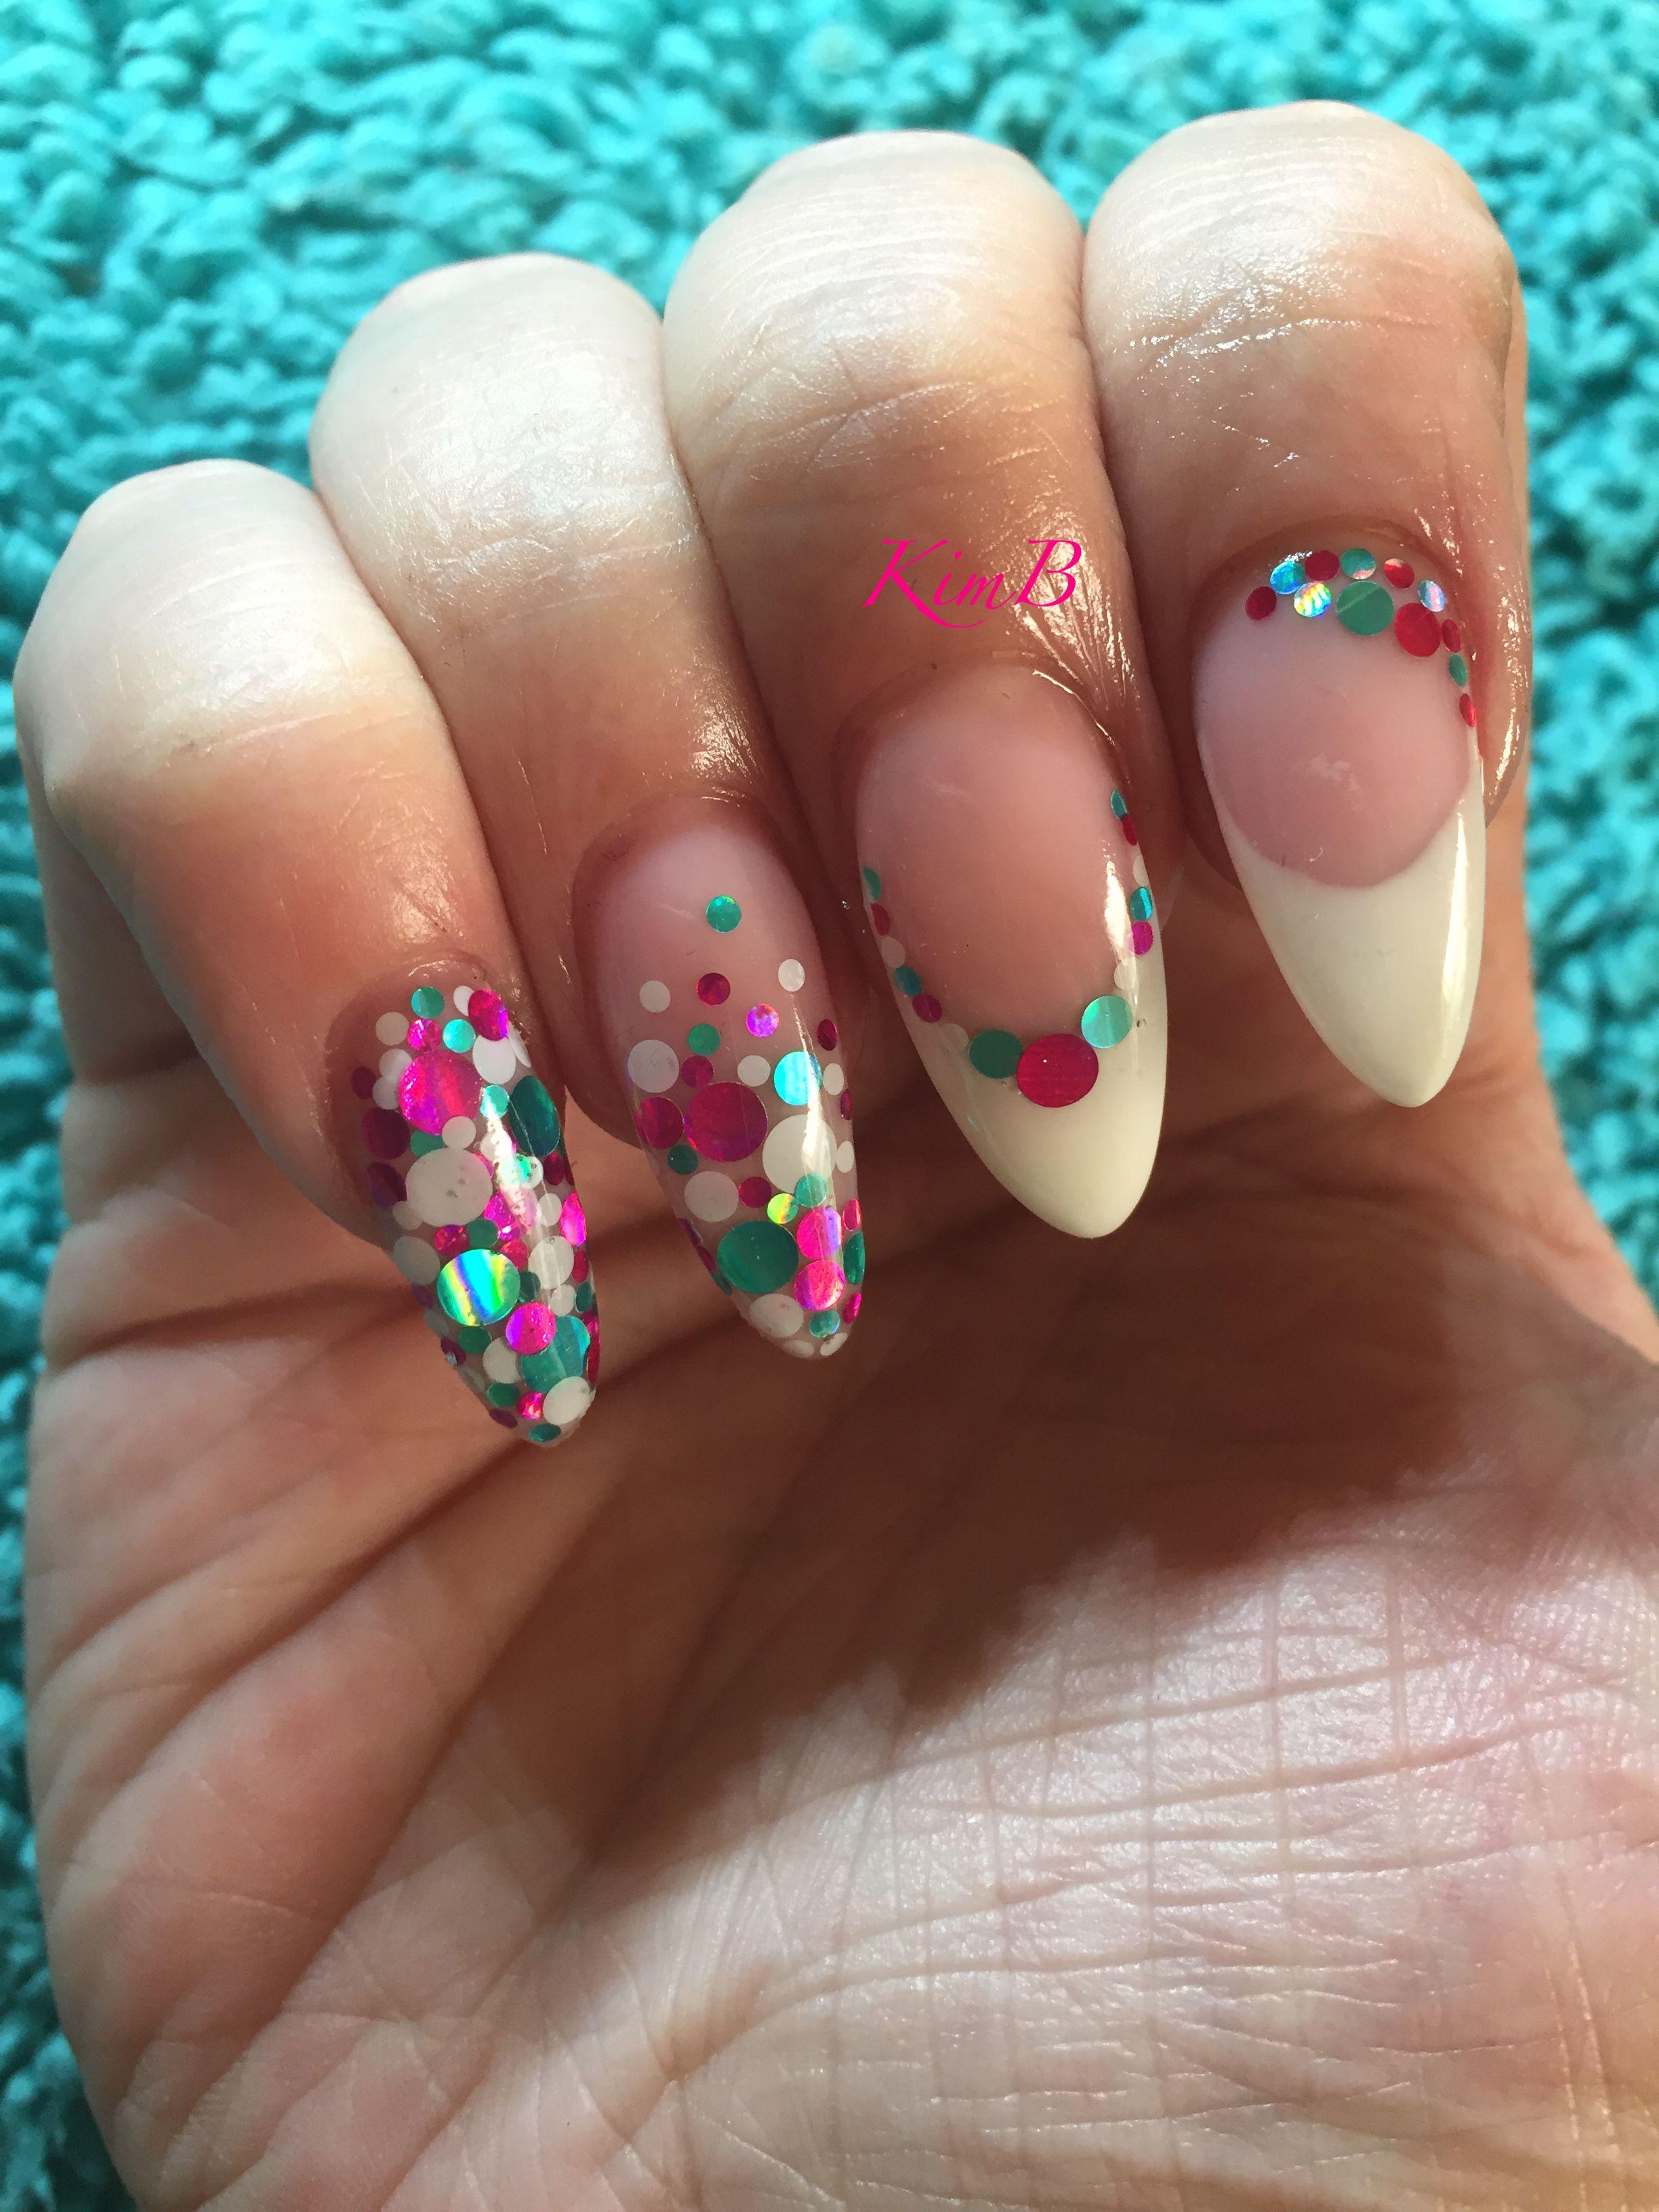 My Own Confetti Nails Instagram Prettynailsbykim Confetti